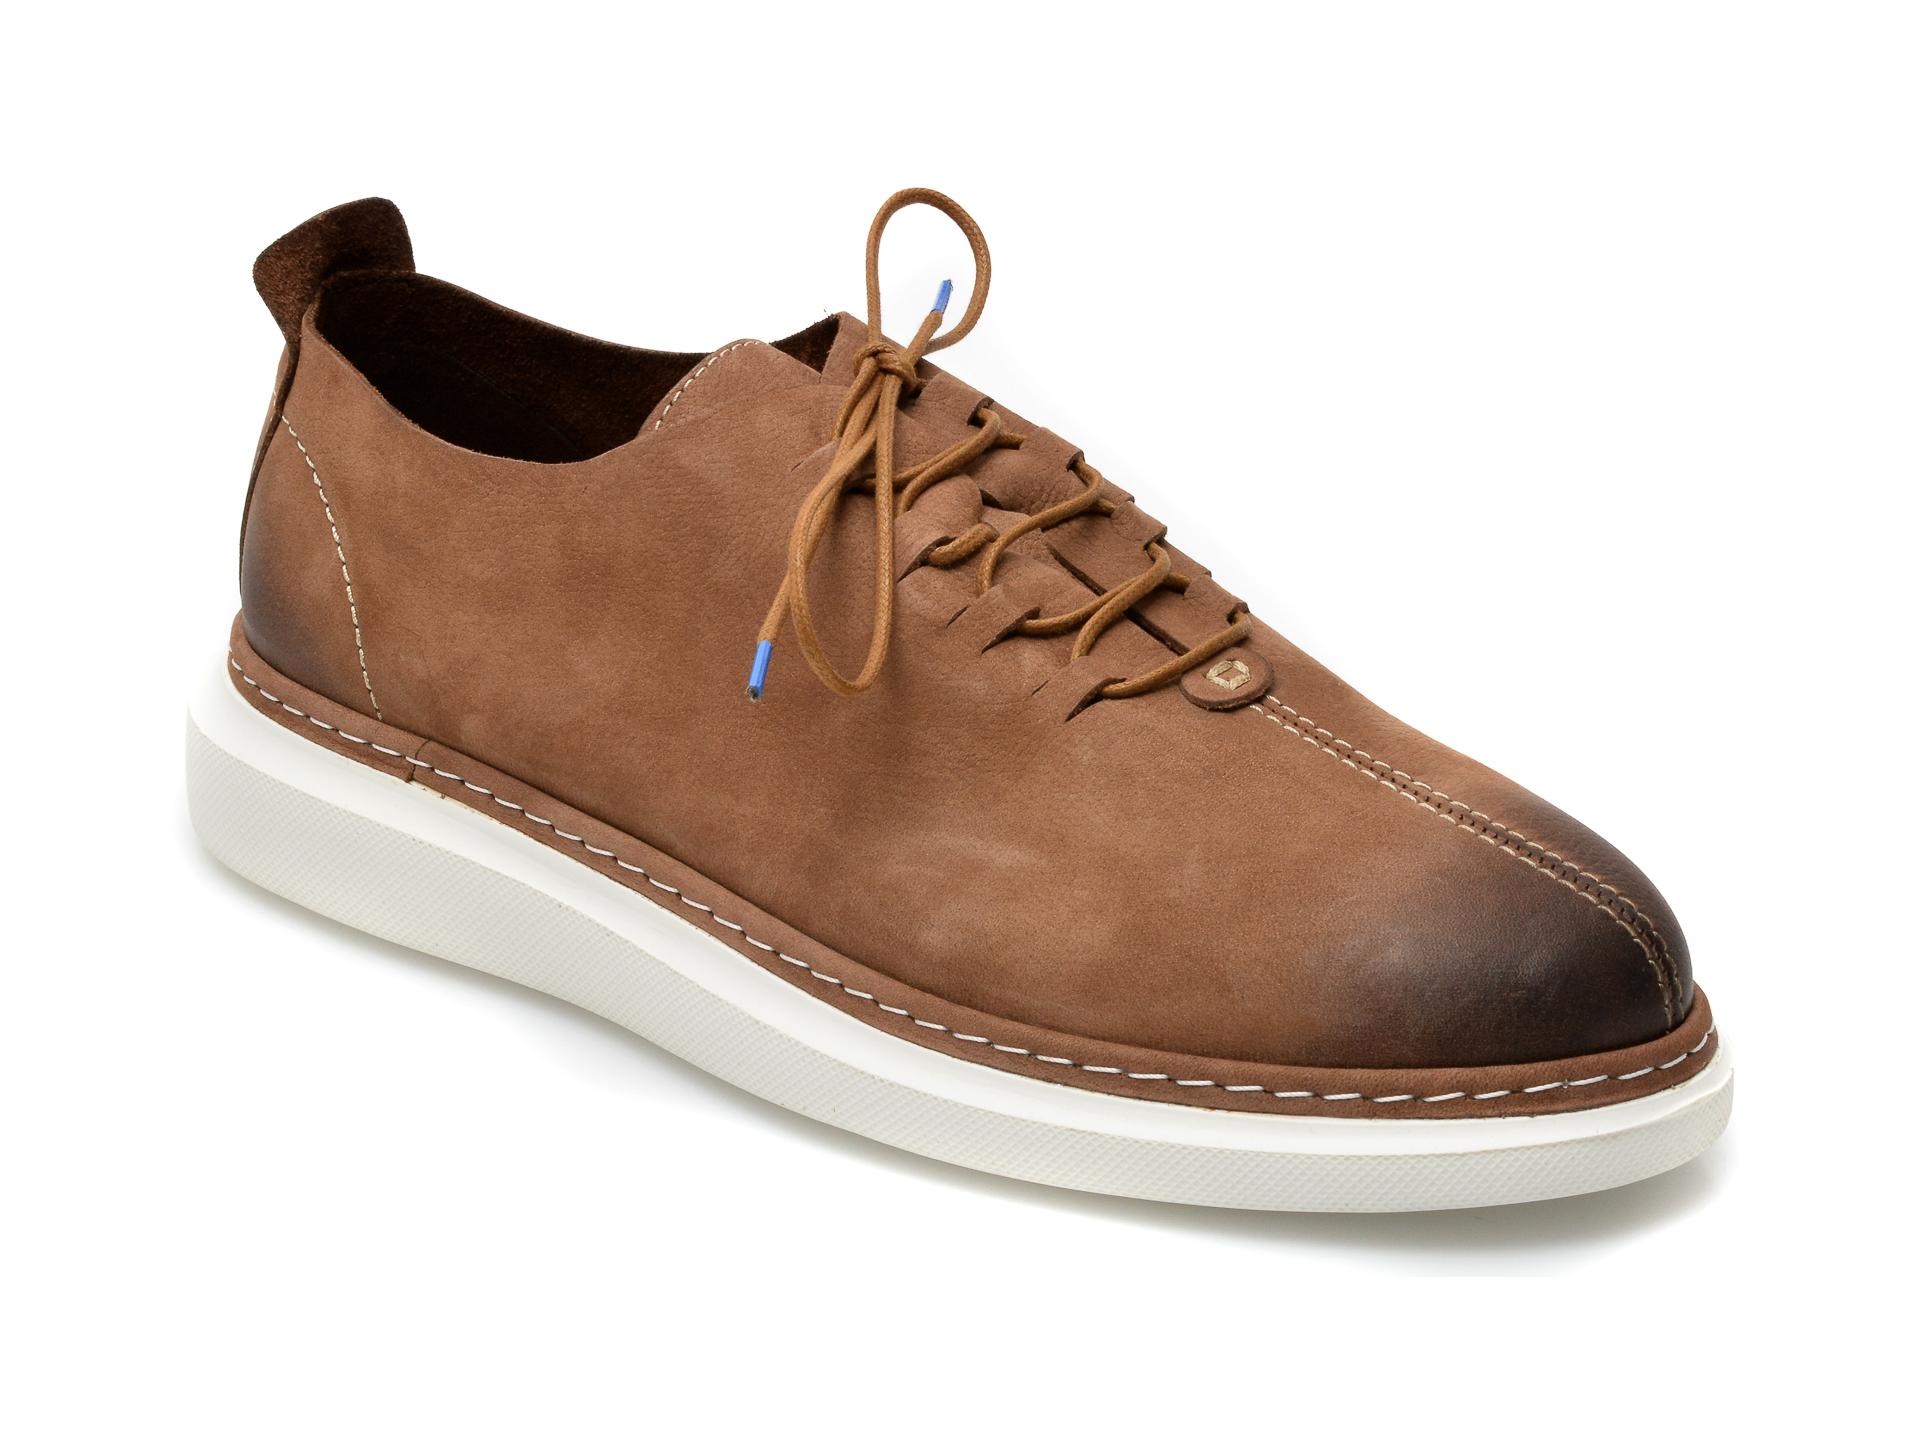 Pantofi OTTER maro, 21KL801, din nabuc imagine otter.ro 2021